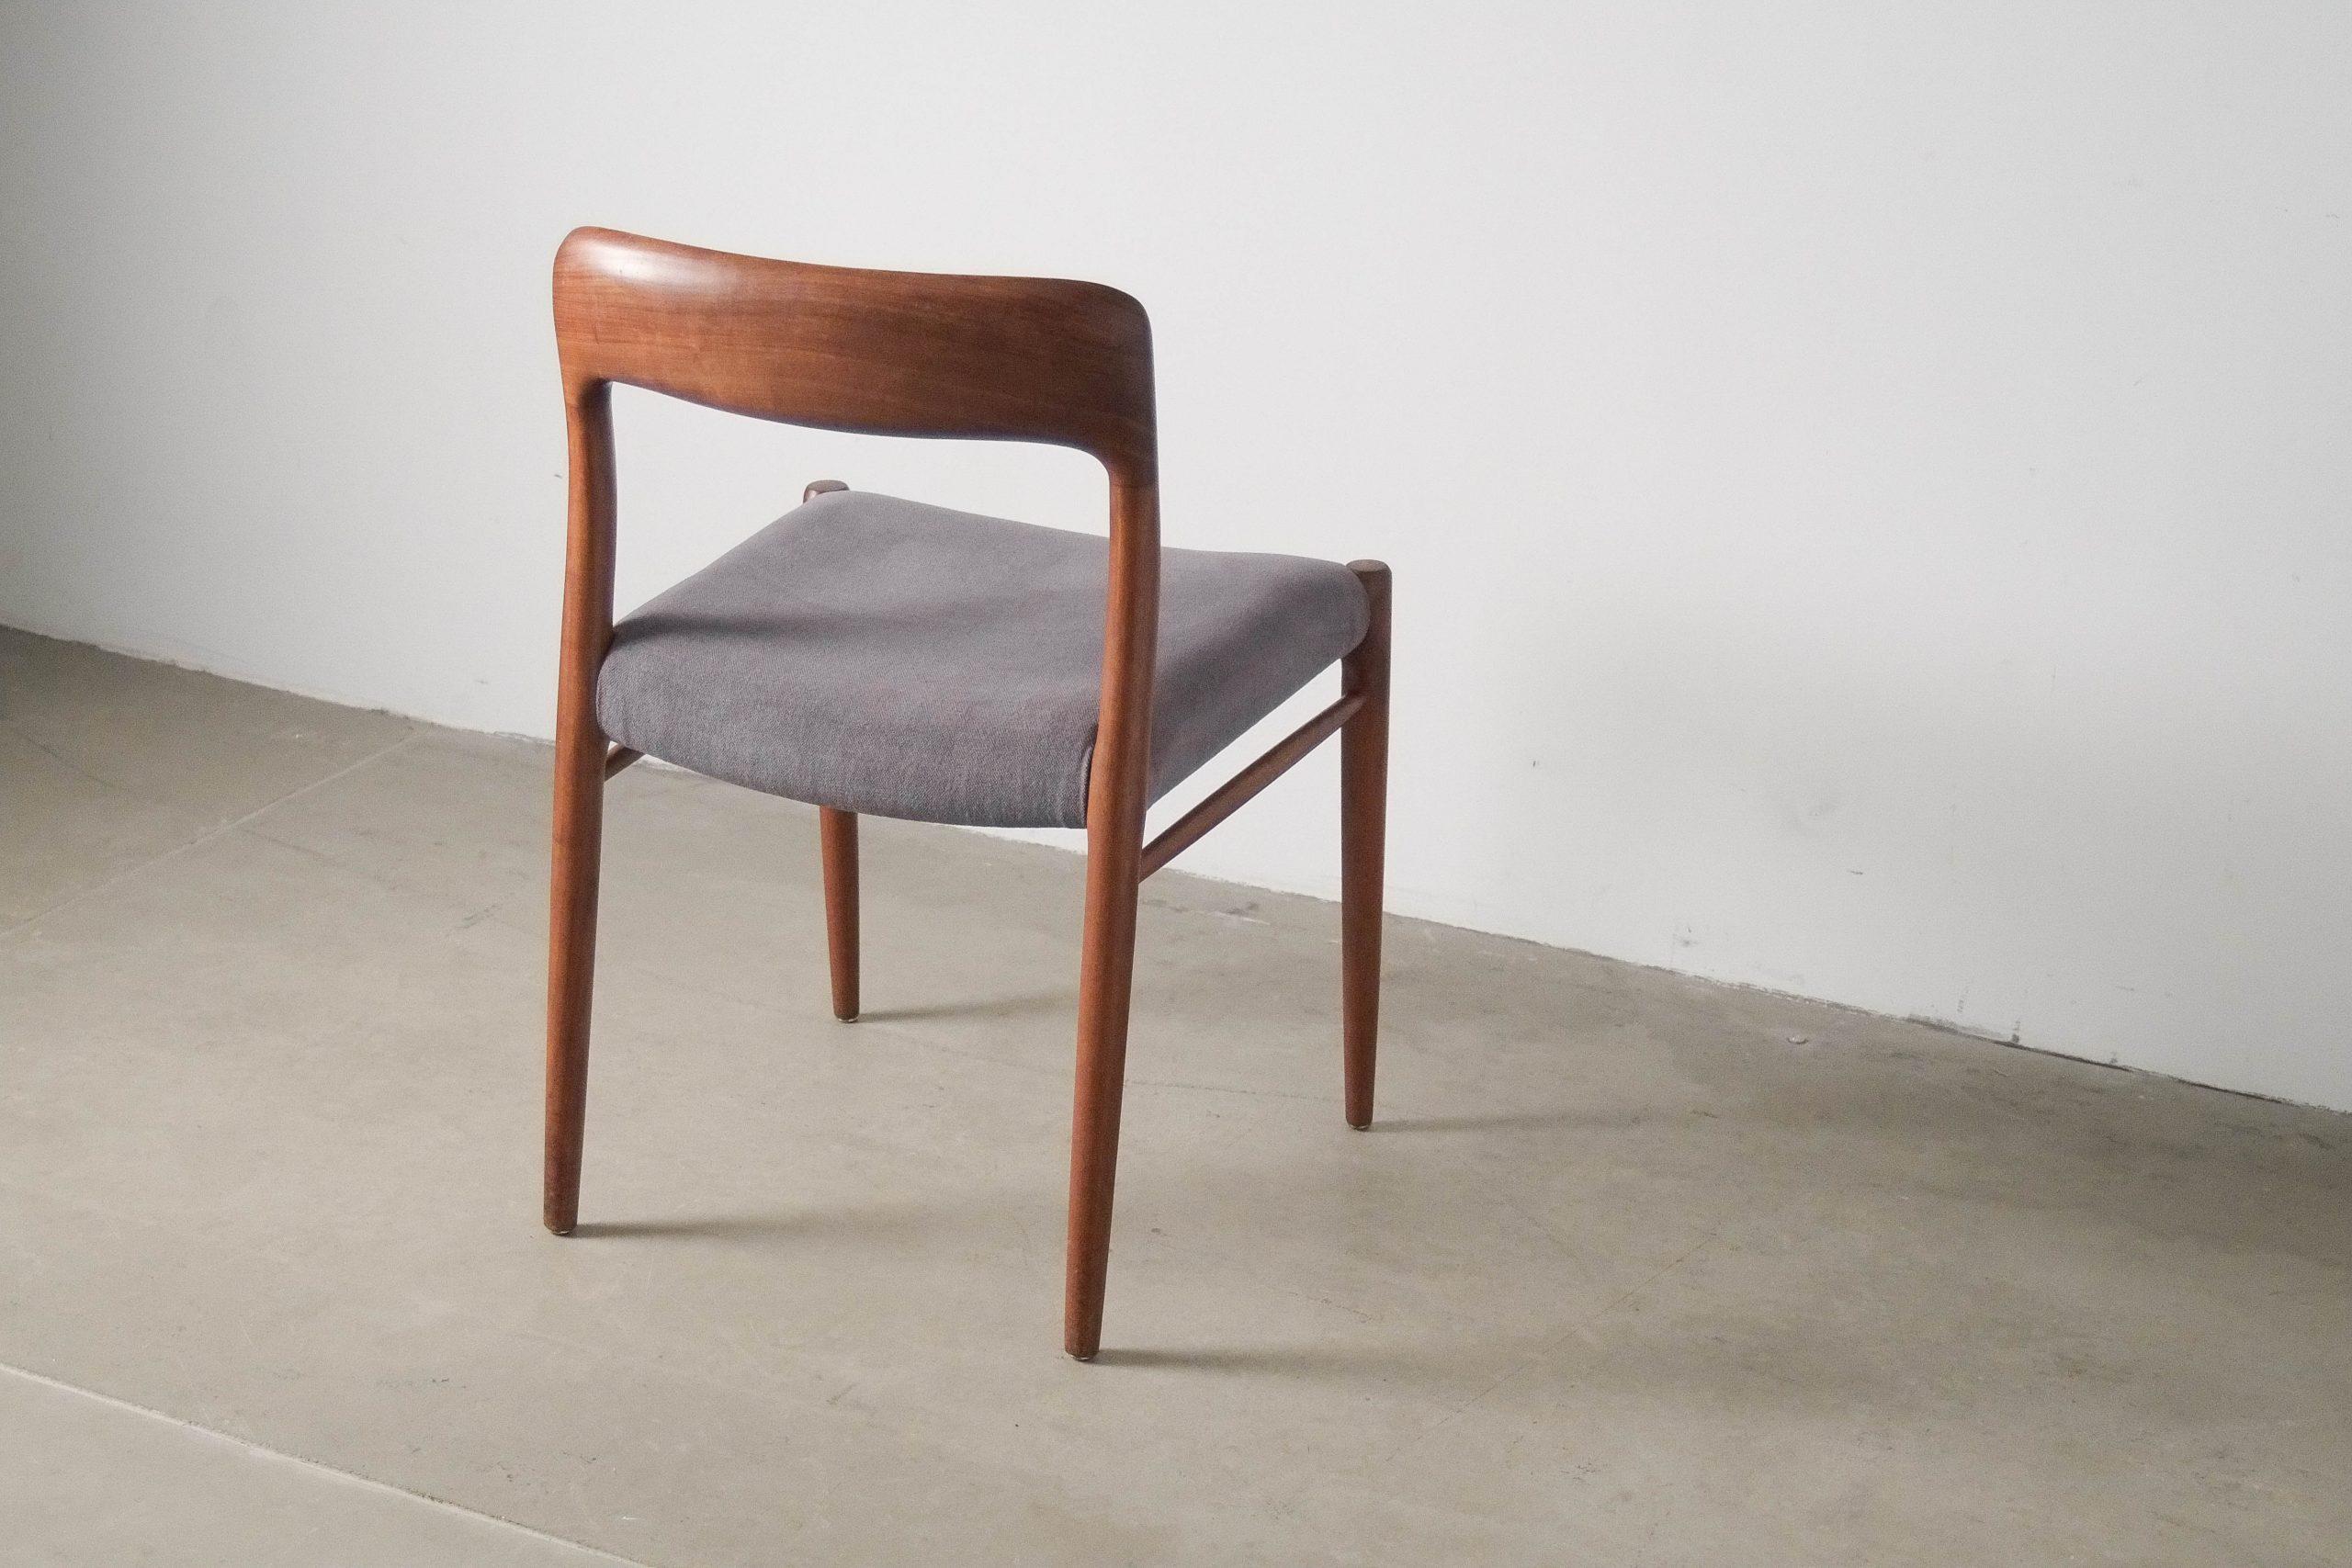 silla respaldo hecha a mano de comedor teca madera tapizada